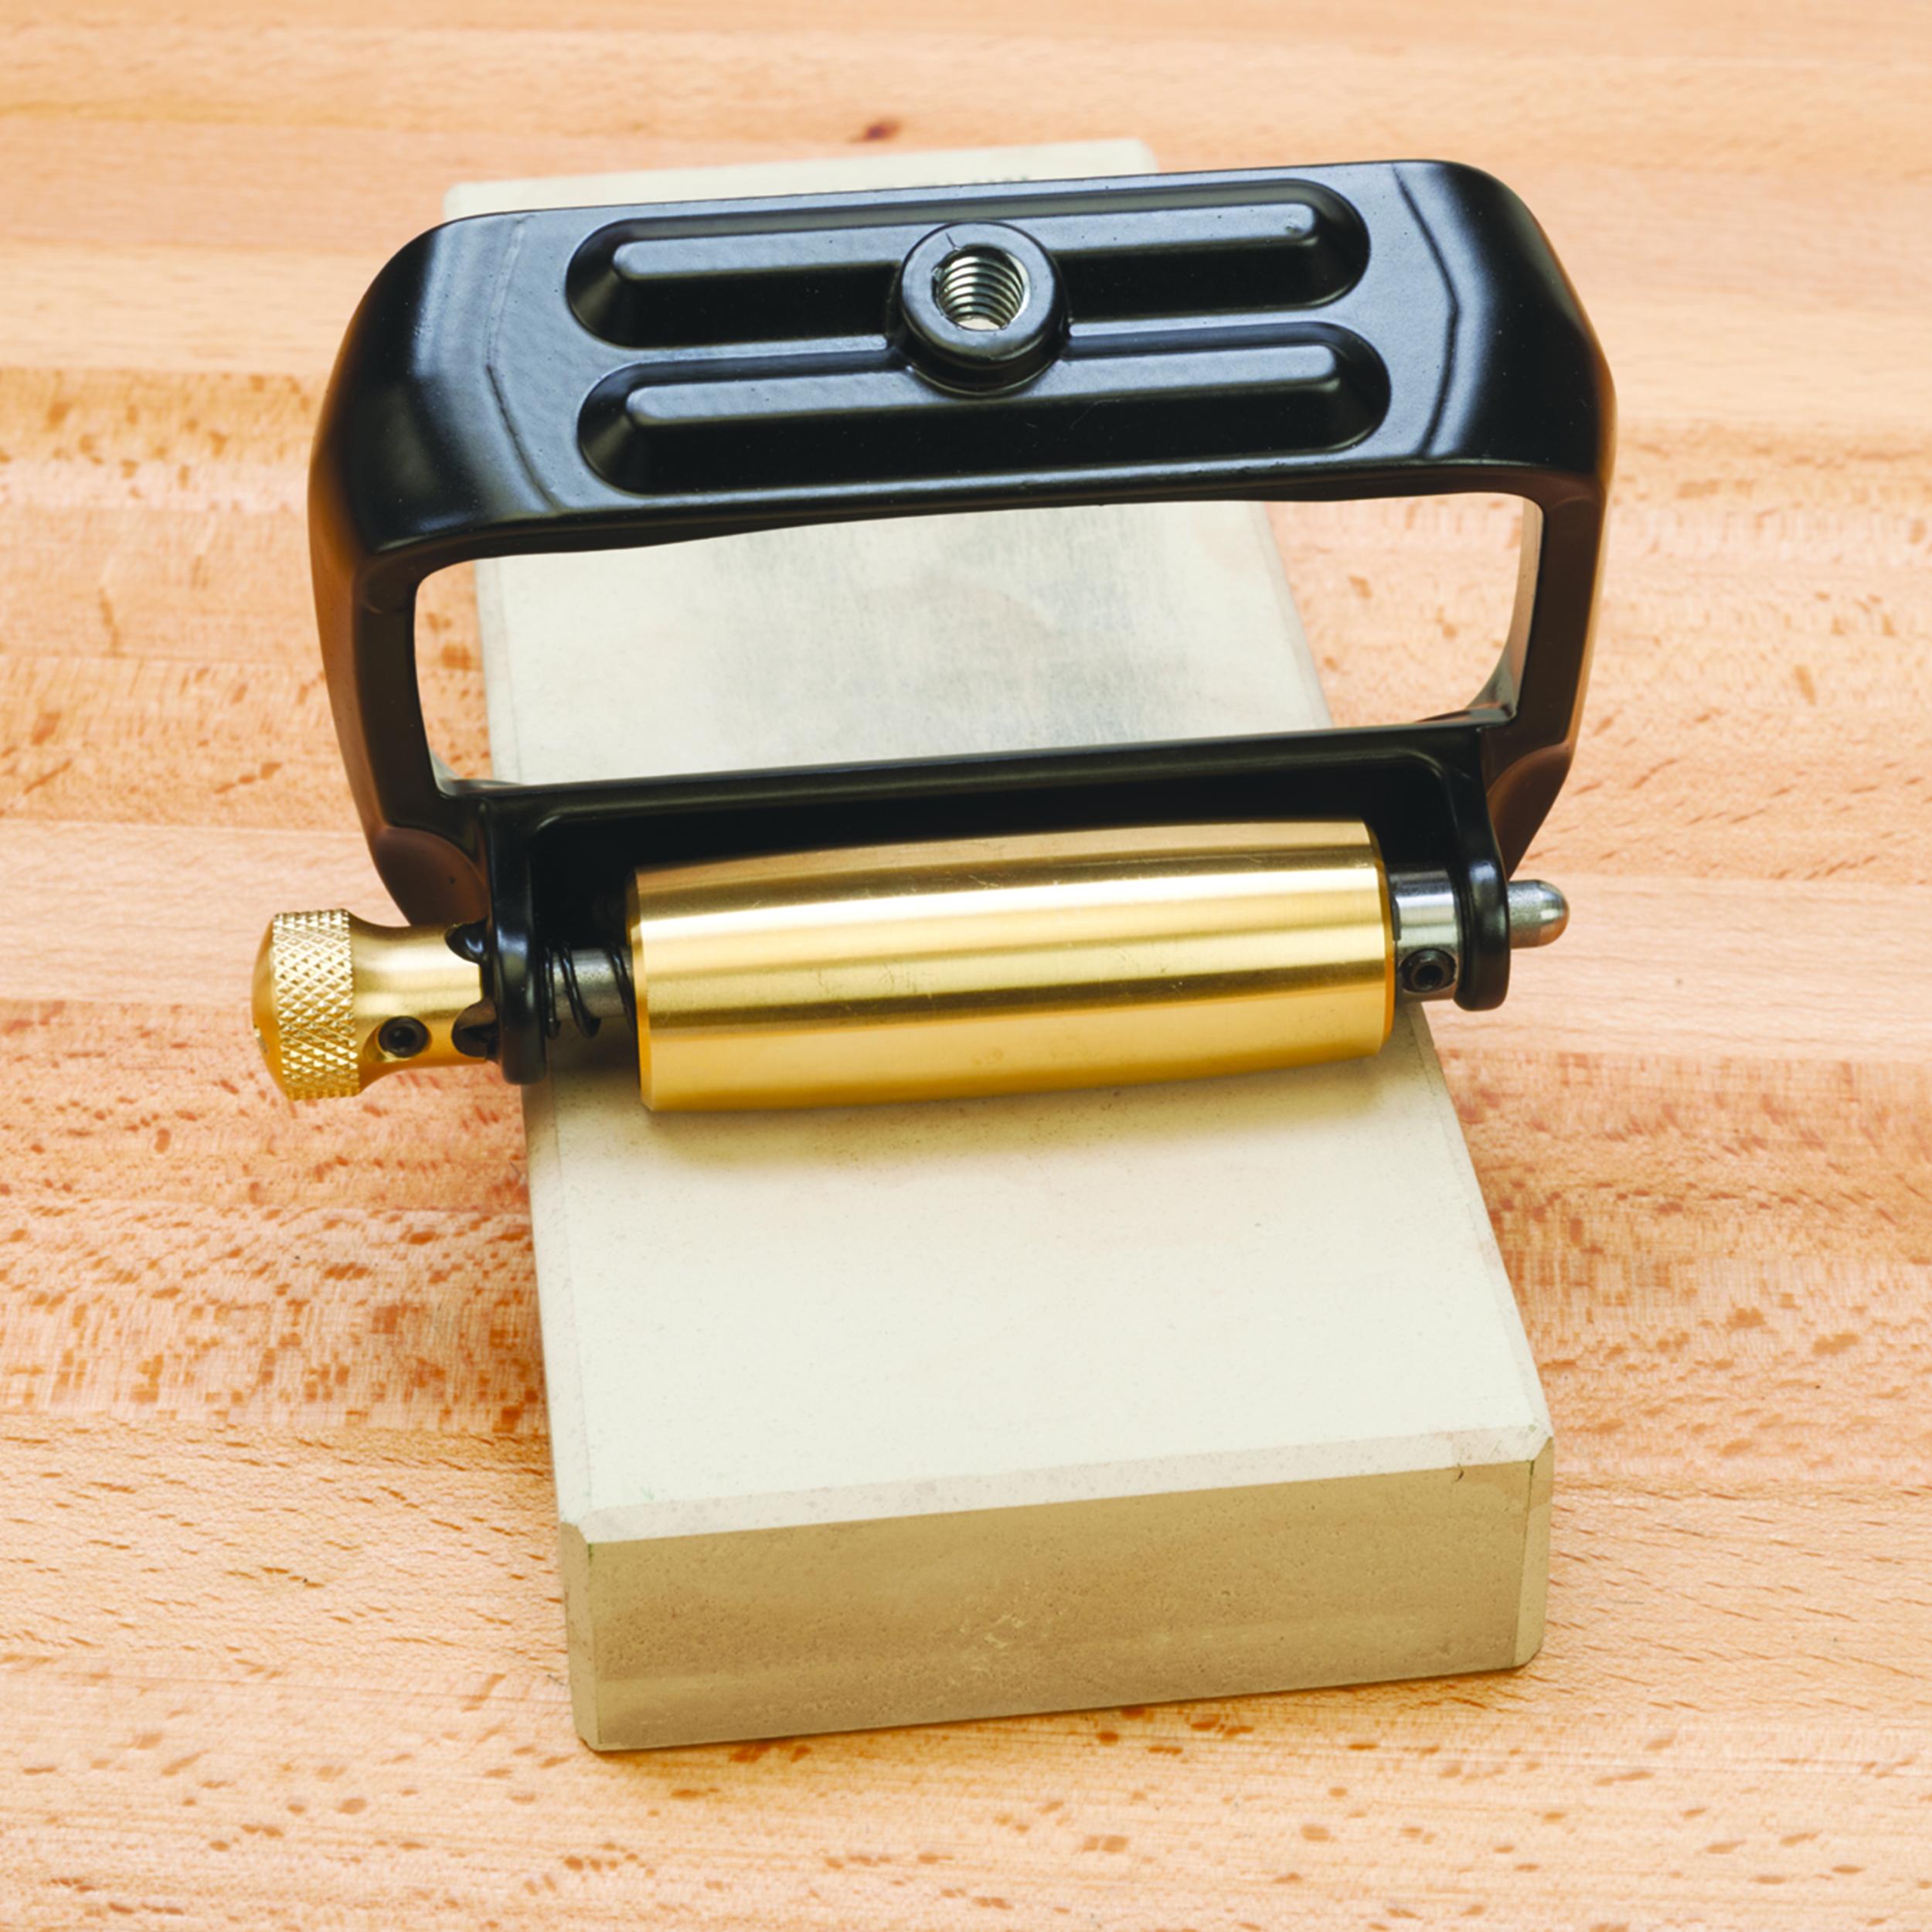 Camber Roller for Mark II Honing Guide